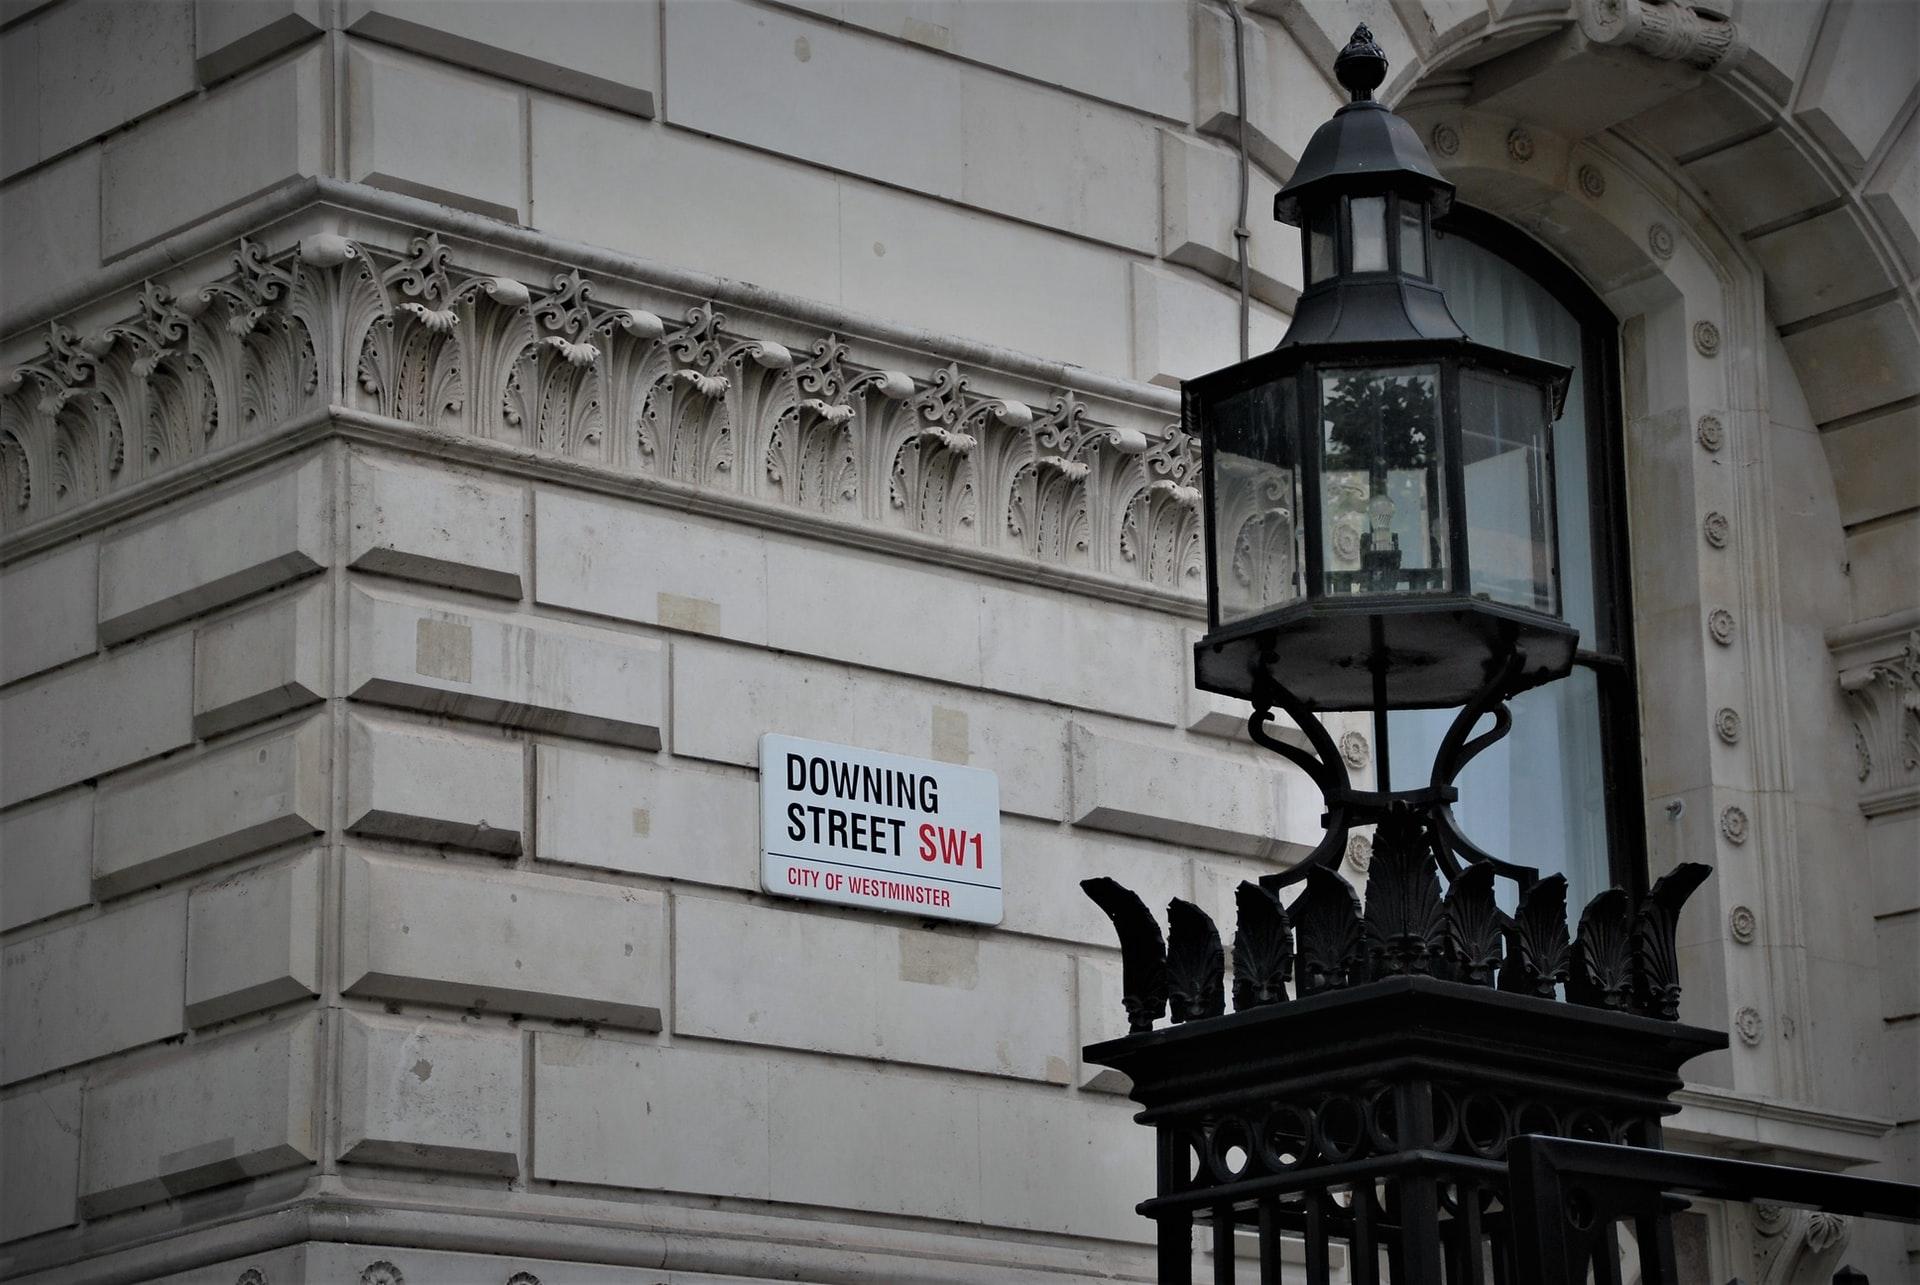 Government Job Retention Scheme: Furlough Leave (As We Understand It On Monday 6th April)